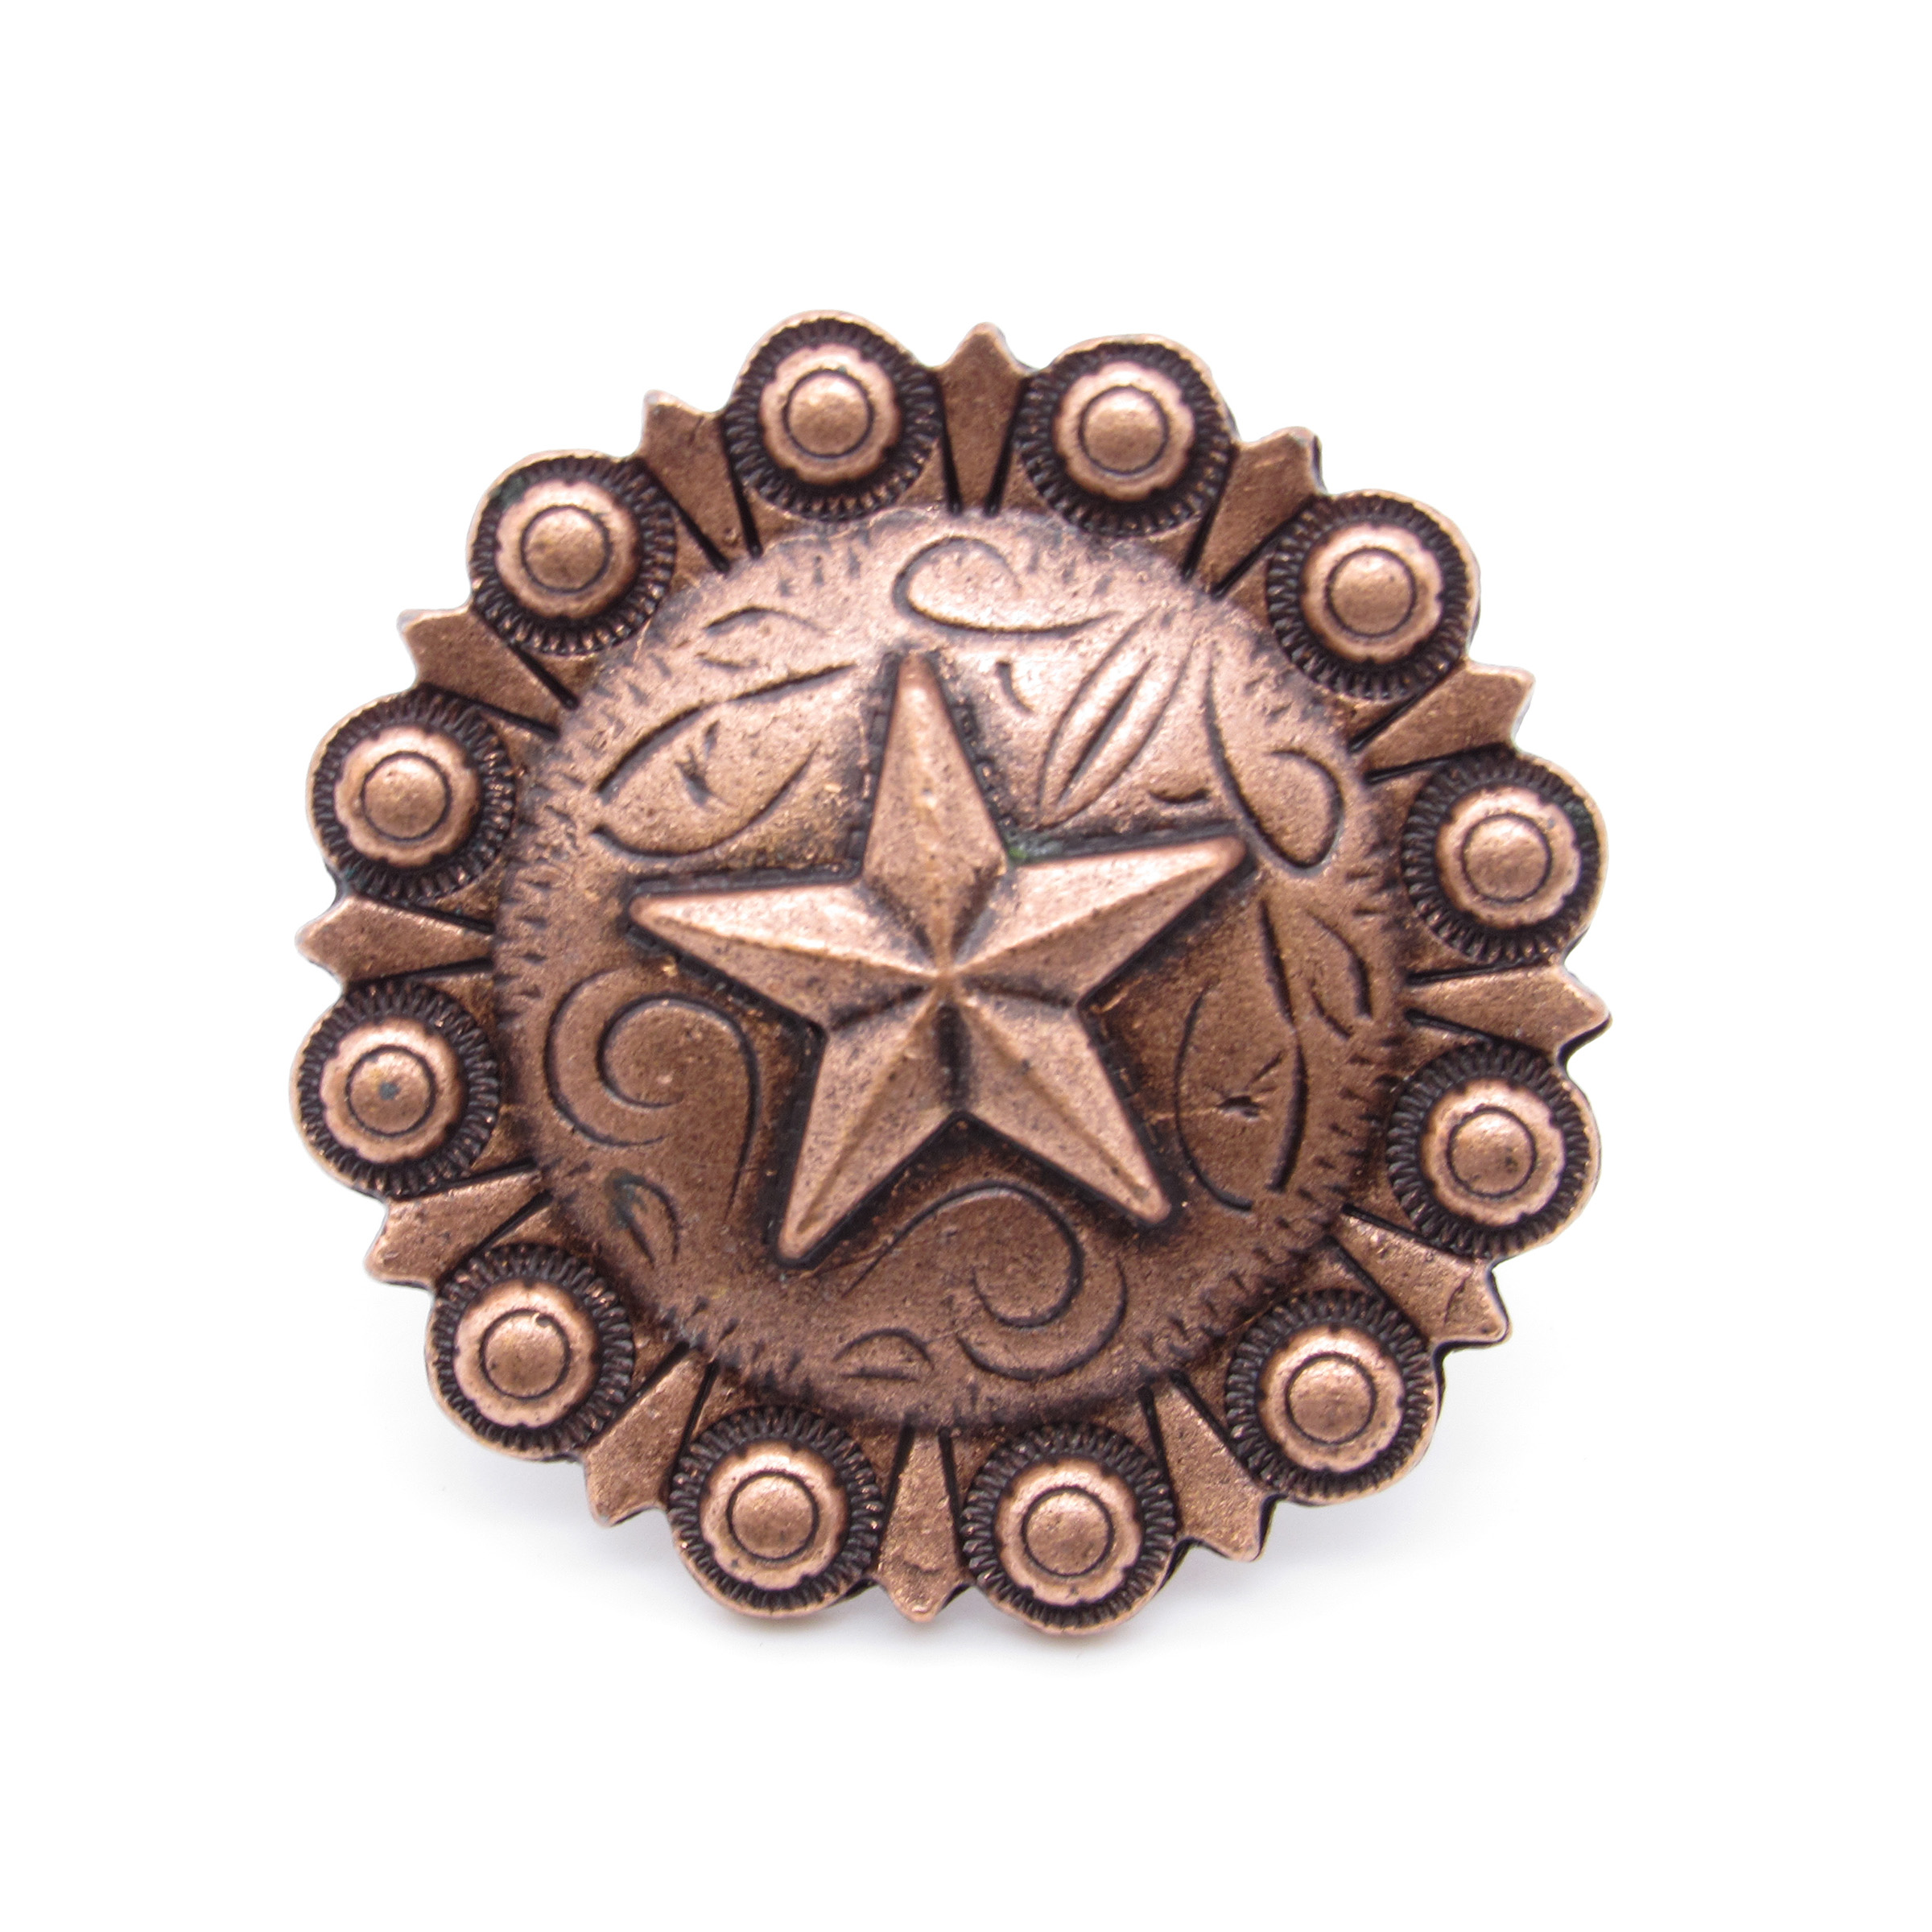 Star Clavo Decorative Nail, 8-Pack, Copper Oxide